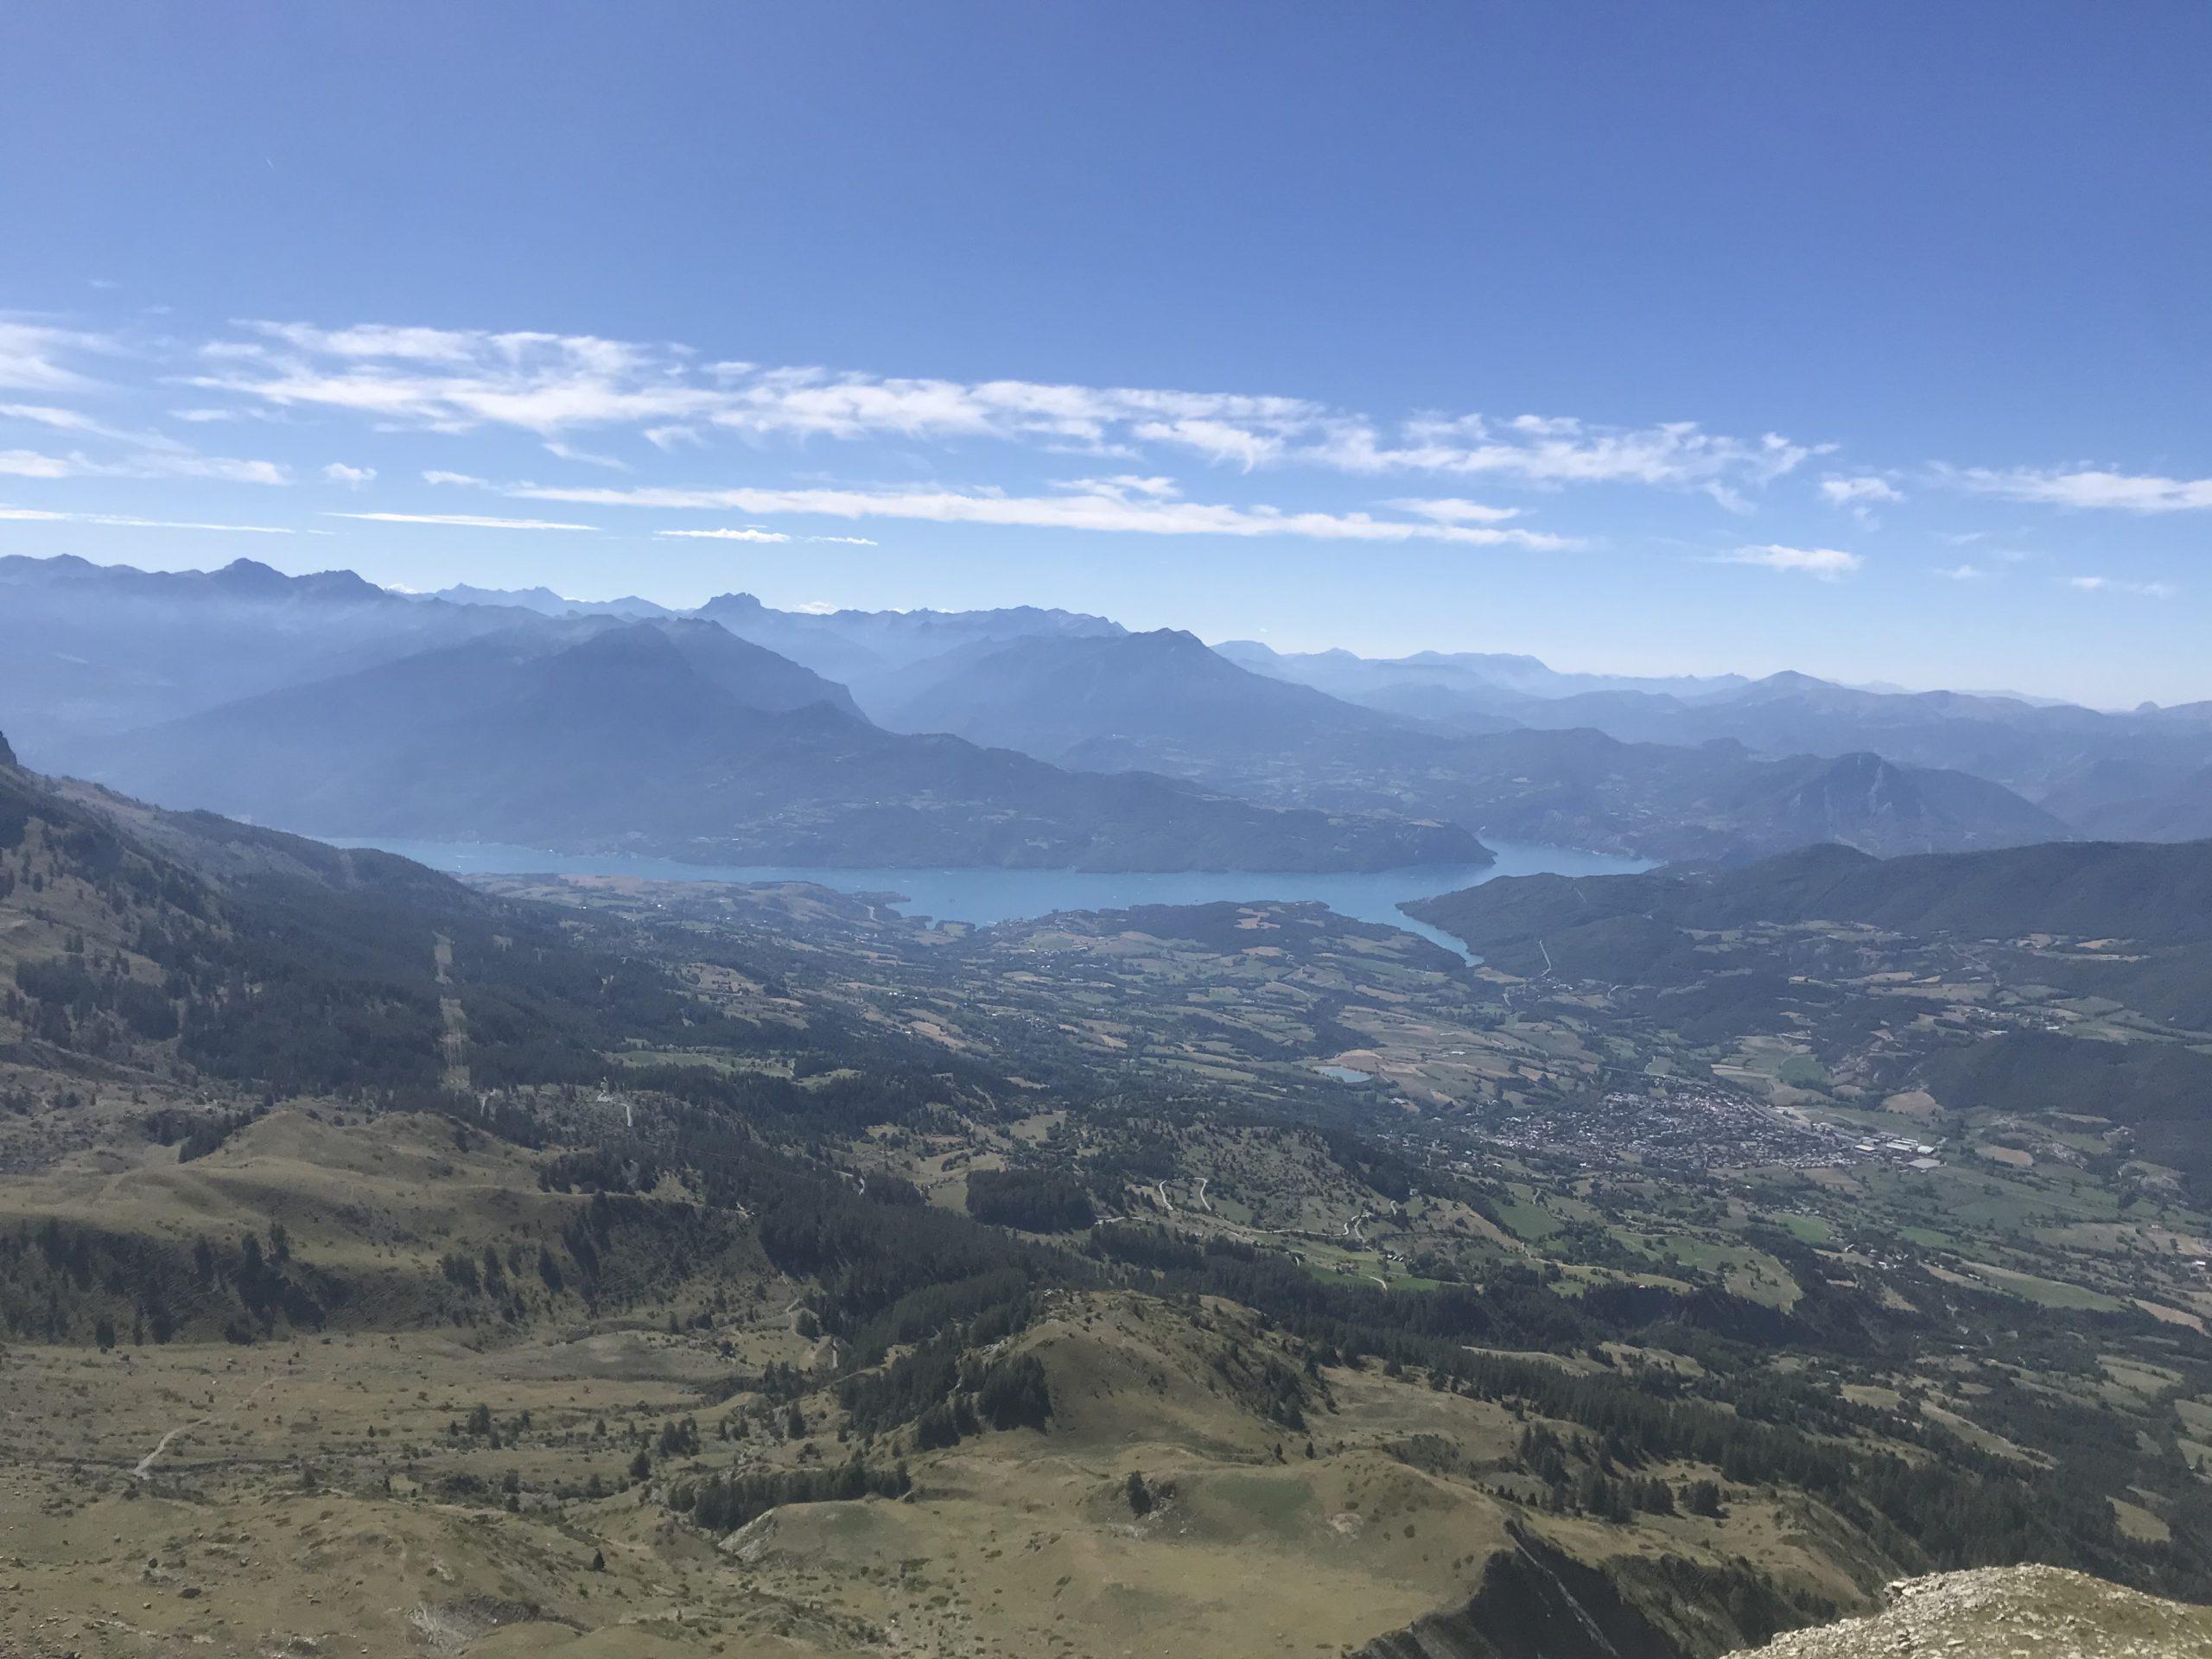 Vue au sommet du Piolit (crédit photo Méryl Recotillet)